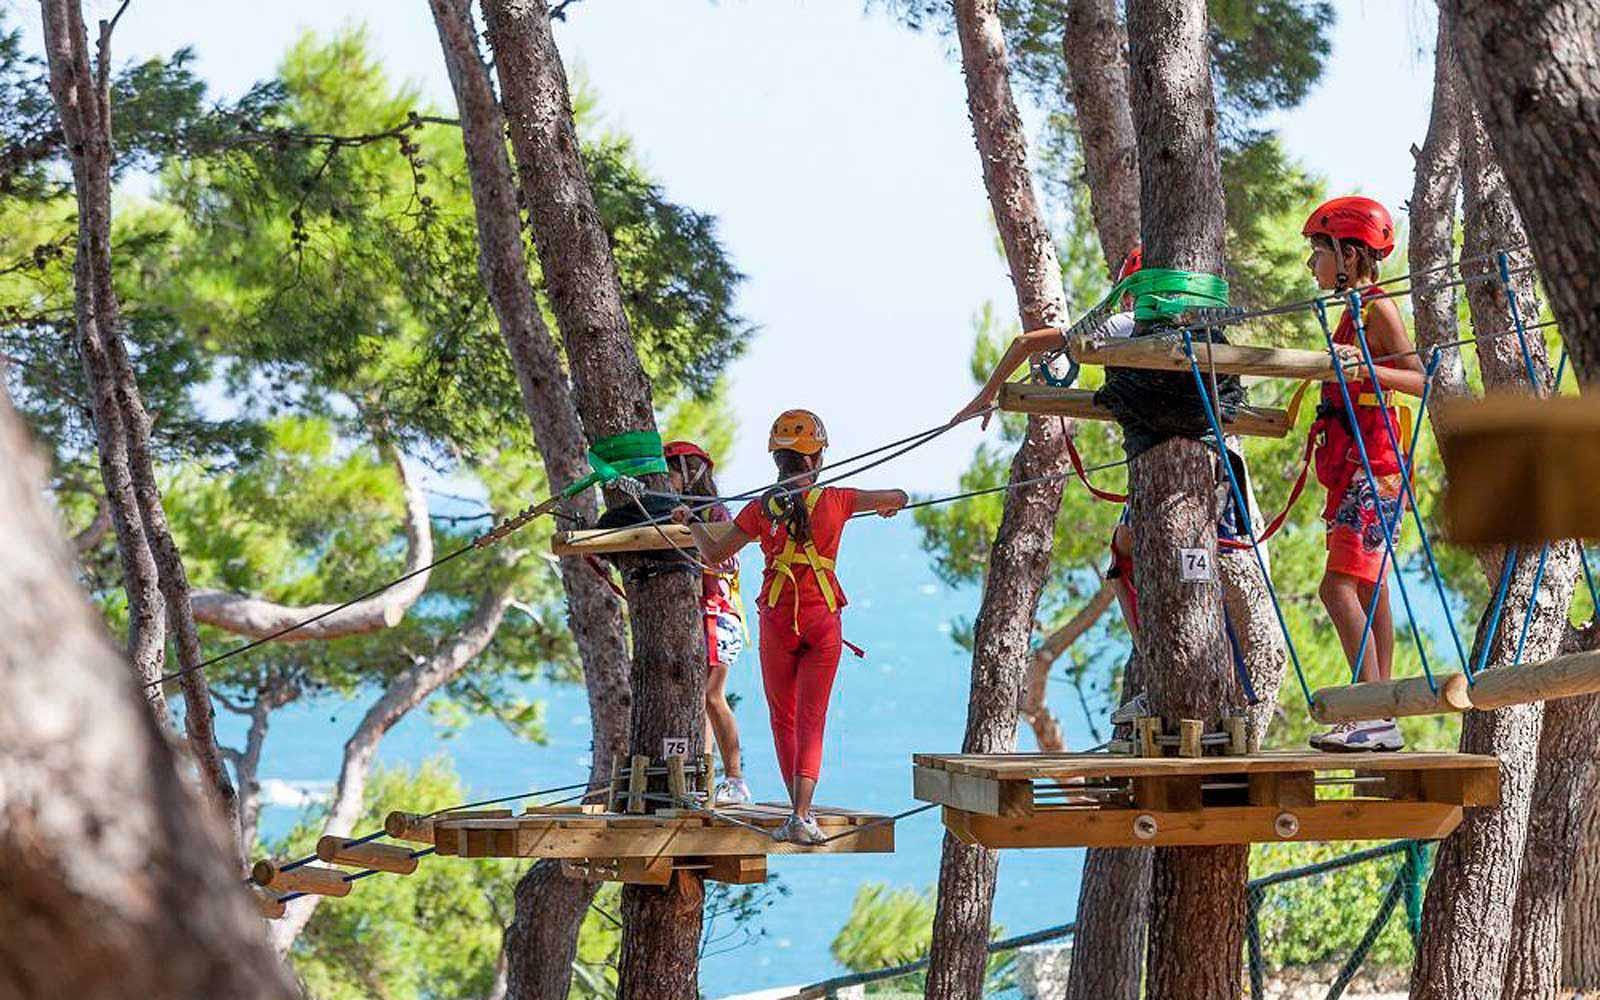 Tree top adventure park at the Gattarella Resort